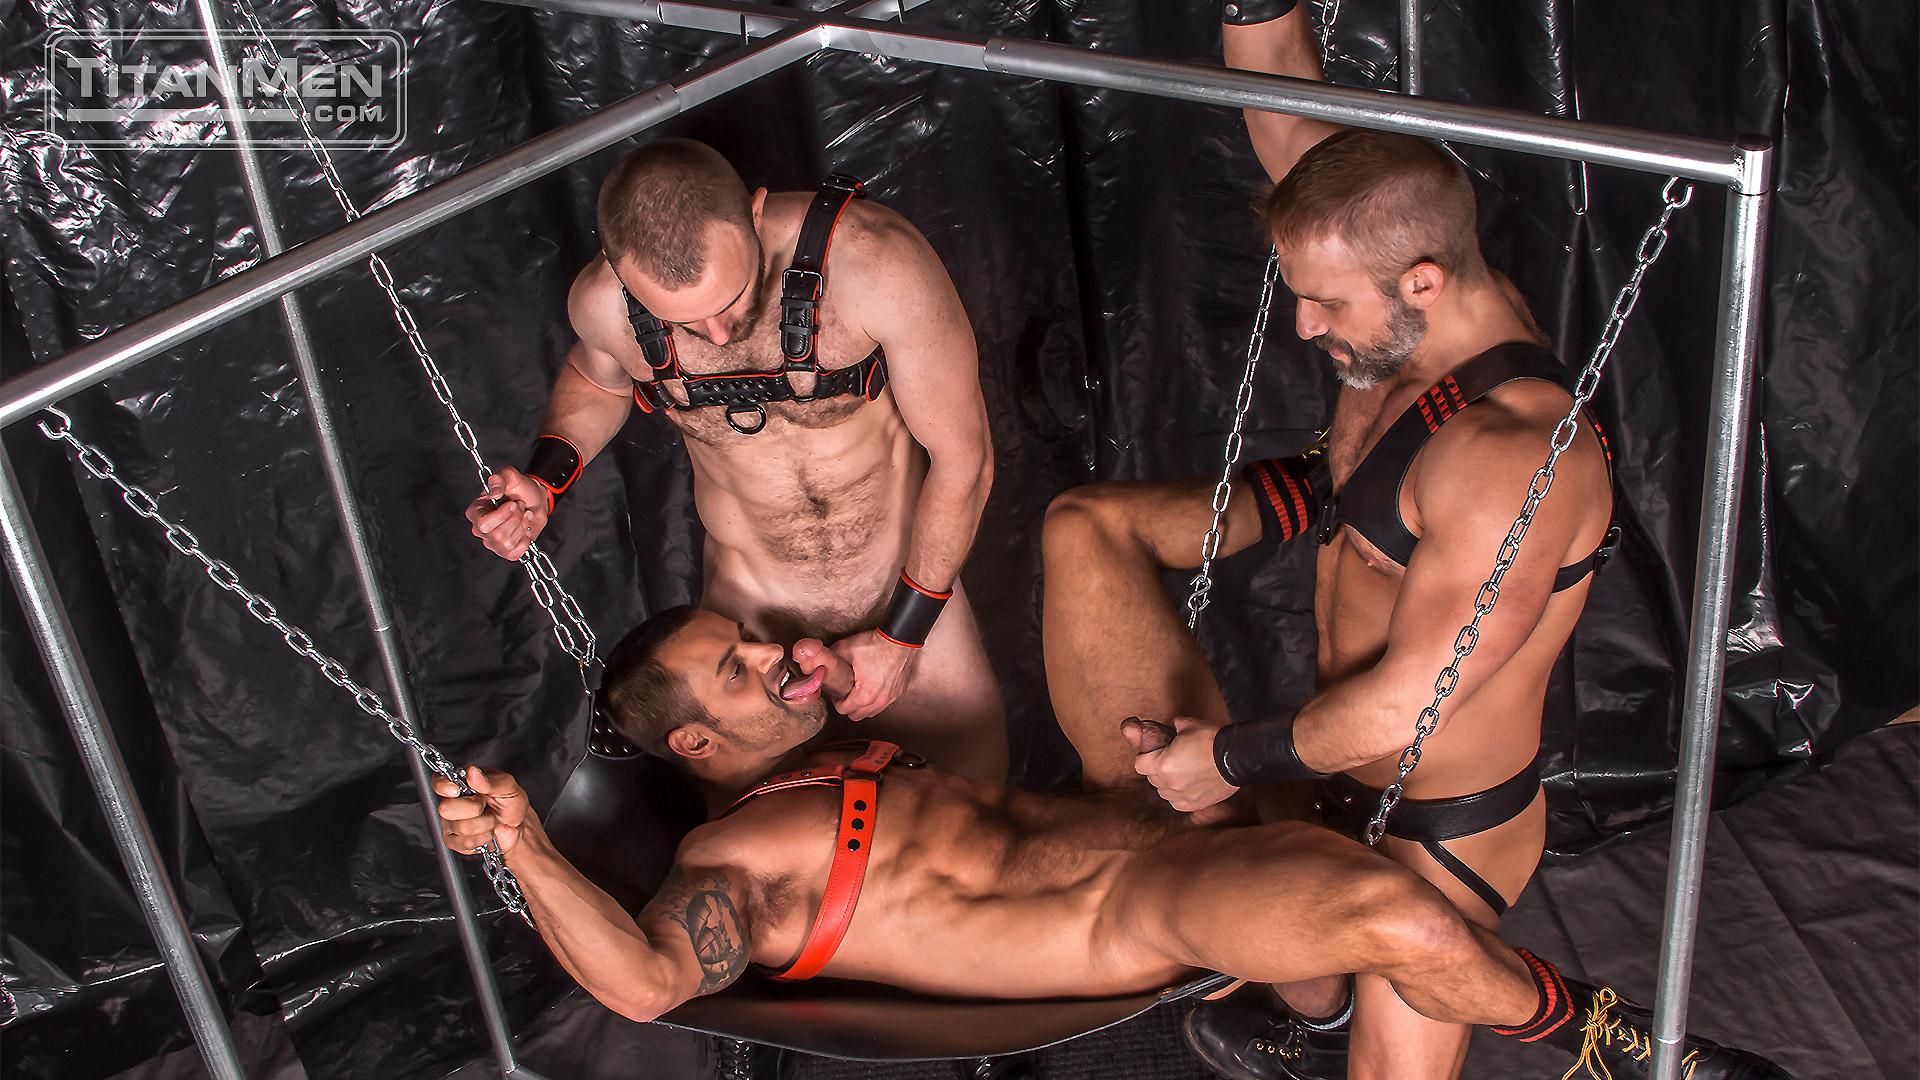 Leather Guys: David Benjamin, Nick Prescott and Dirk Caber